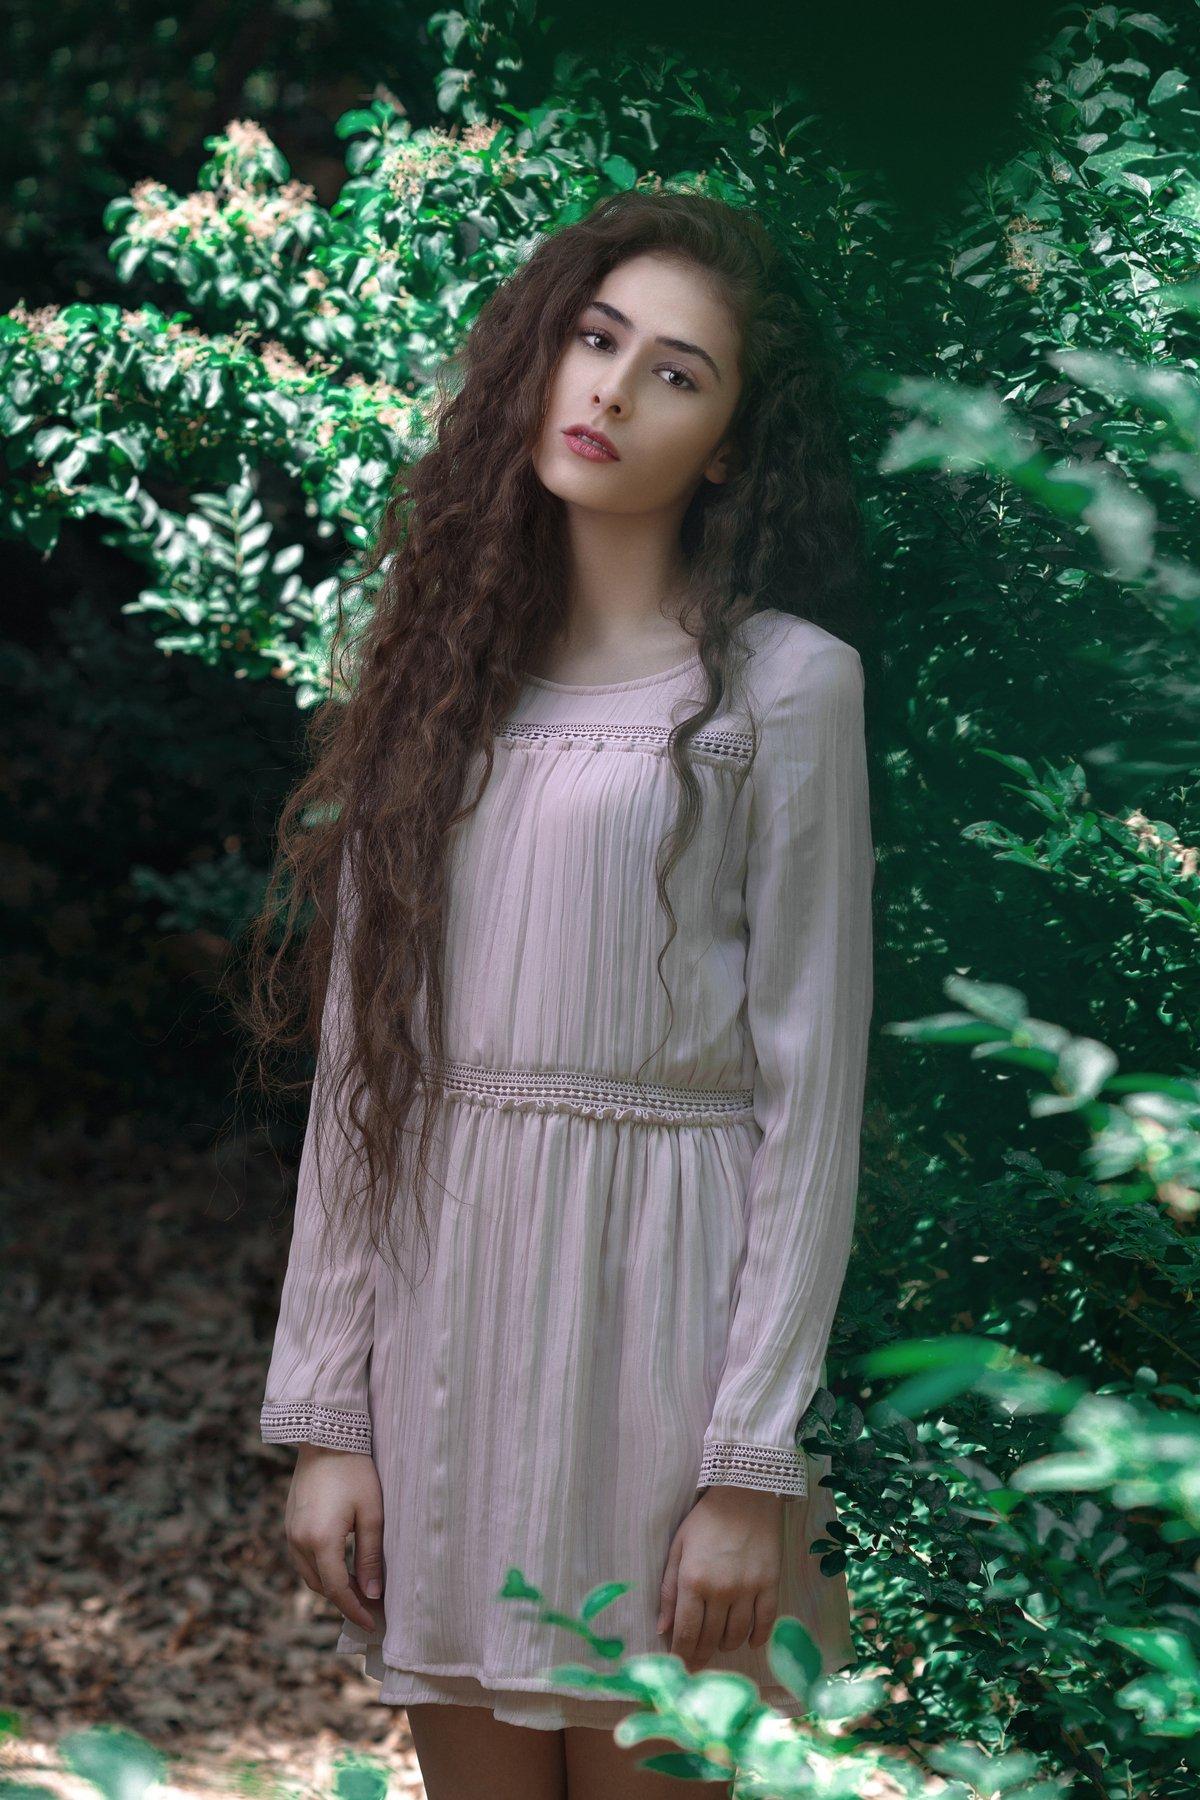 Beautifull,portrait,natural,light,girl,hair, Amirhossein kazemi